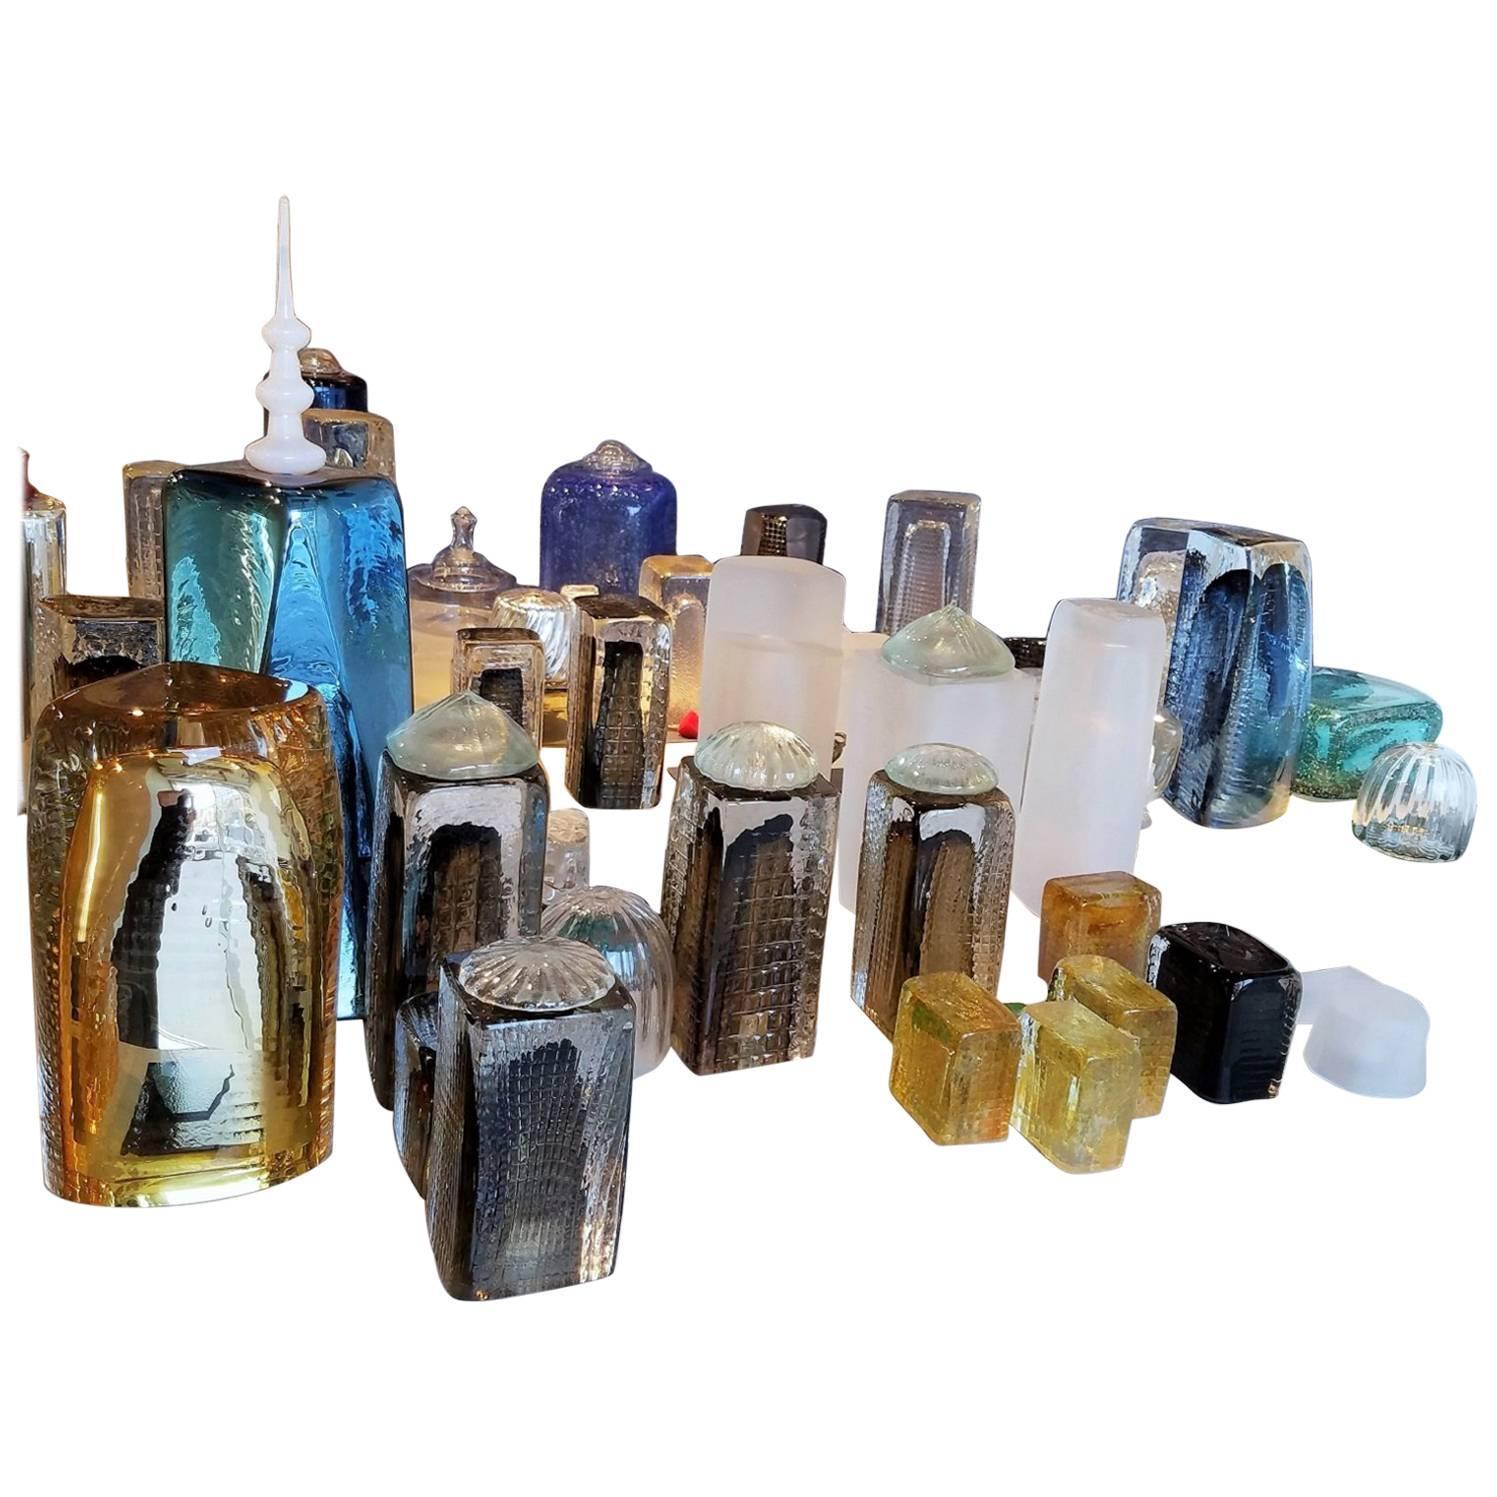 Downtown - Handmade Glass Skyline of Lower Manhattan, Contemporary, Modern